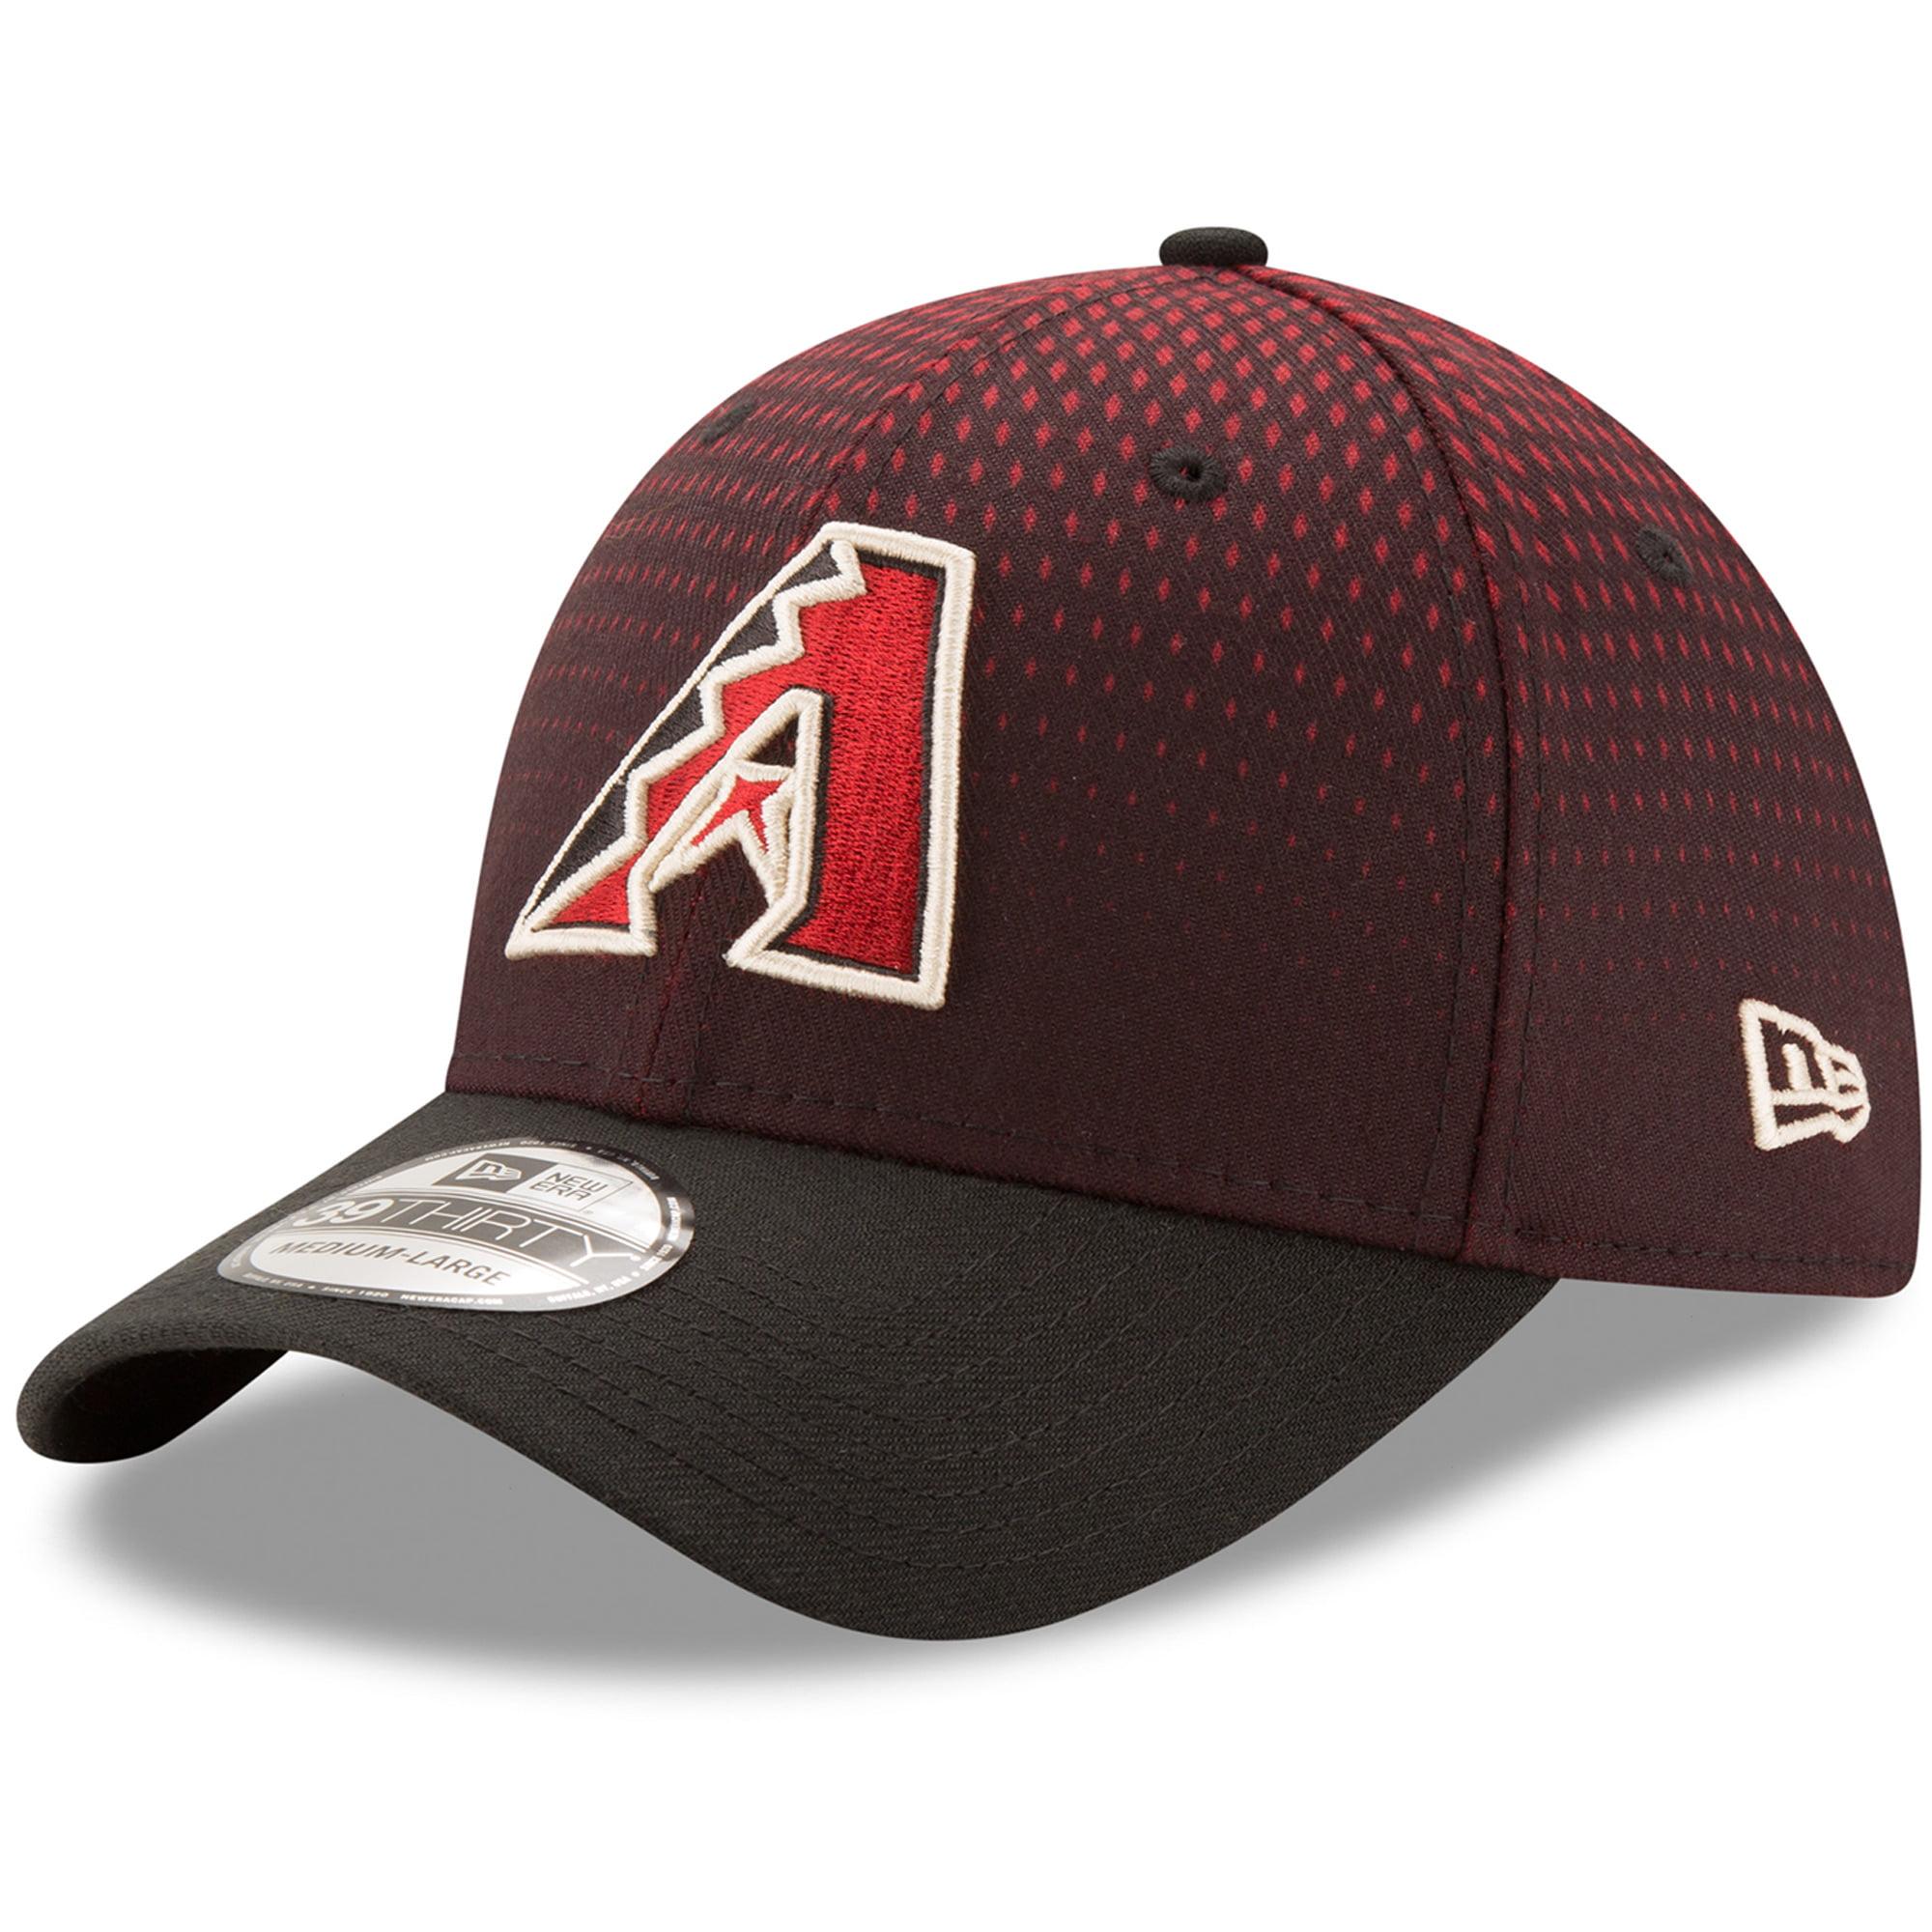 Arizona Diamondbacks New Era Game Team Classic 39THIRTY Flex Hat - Black